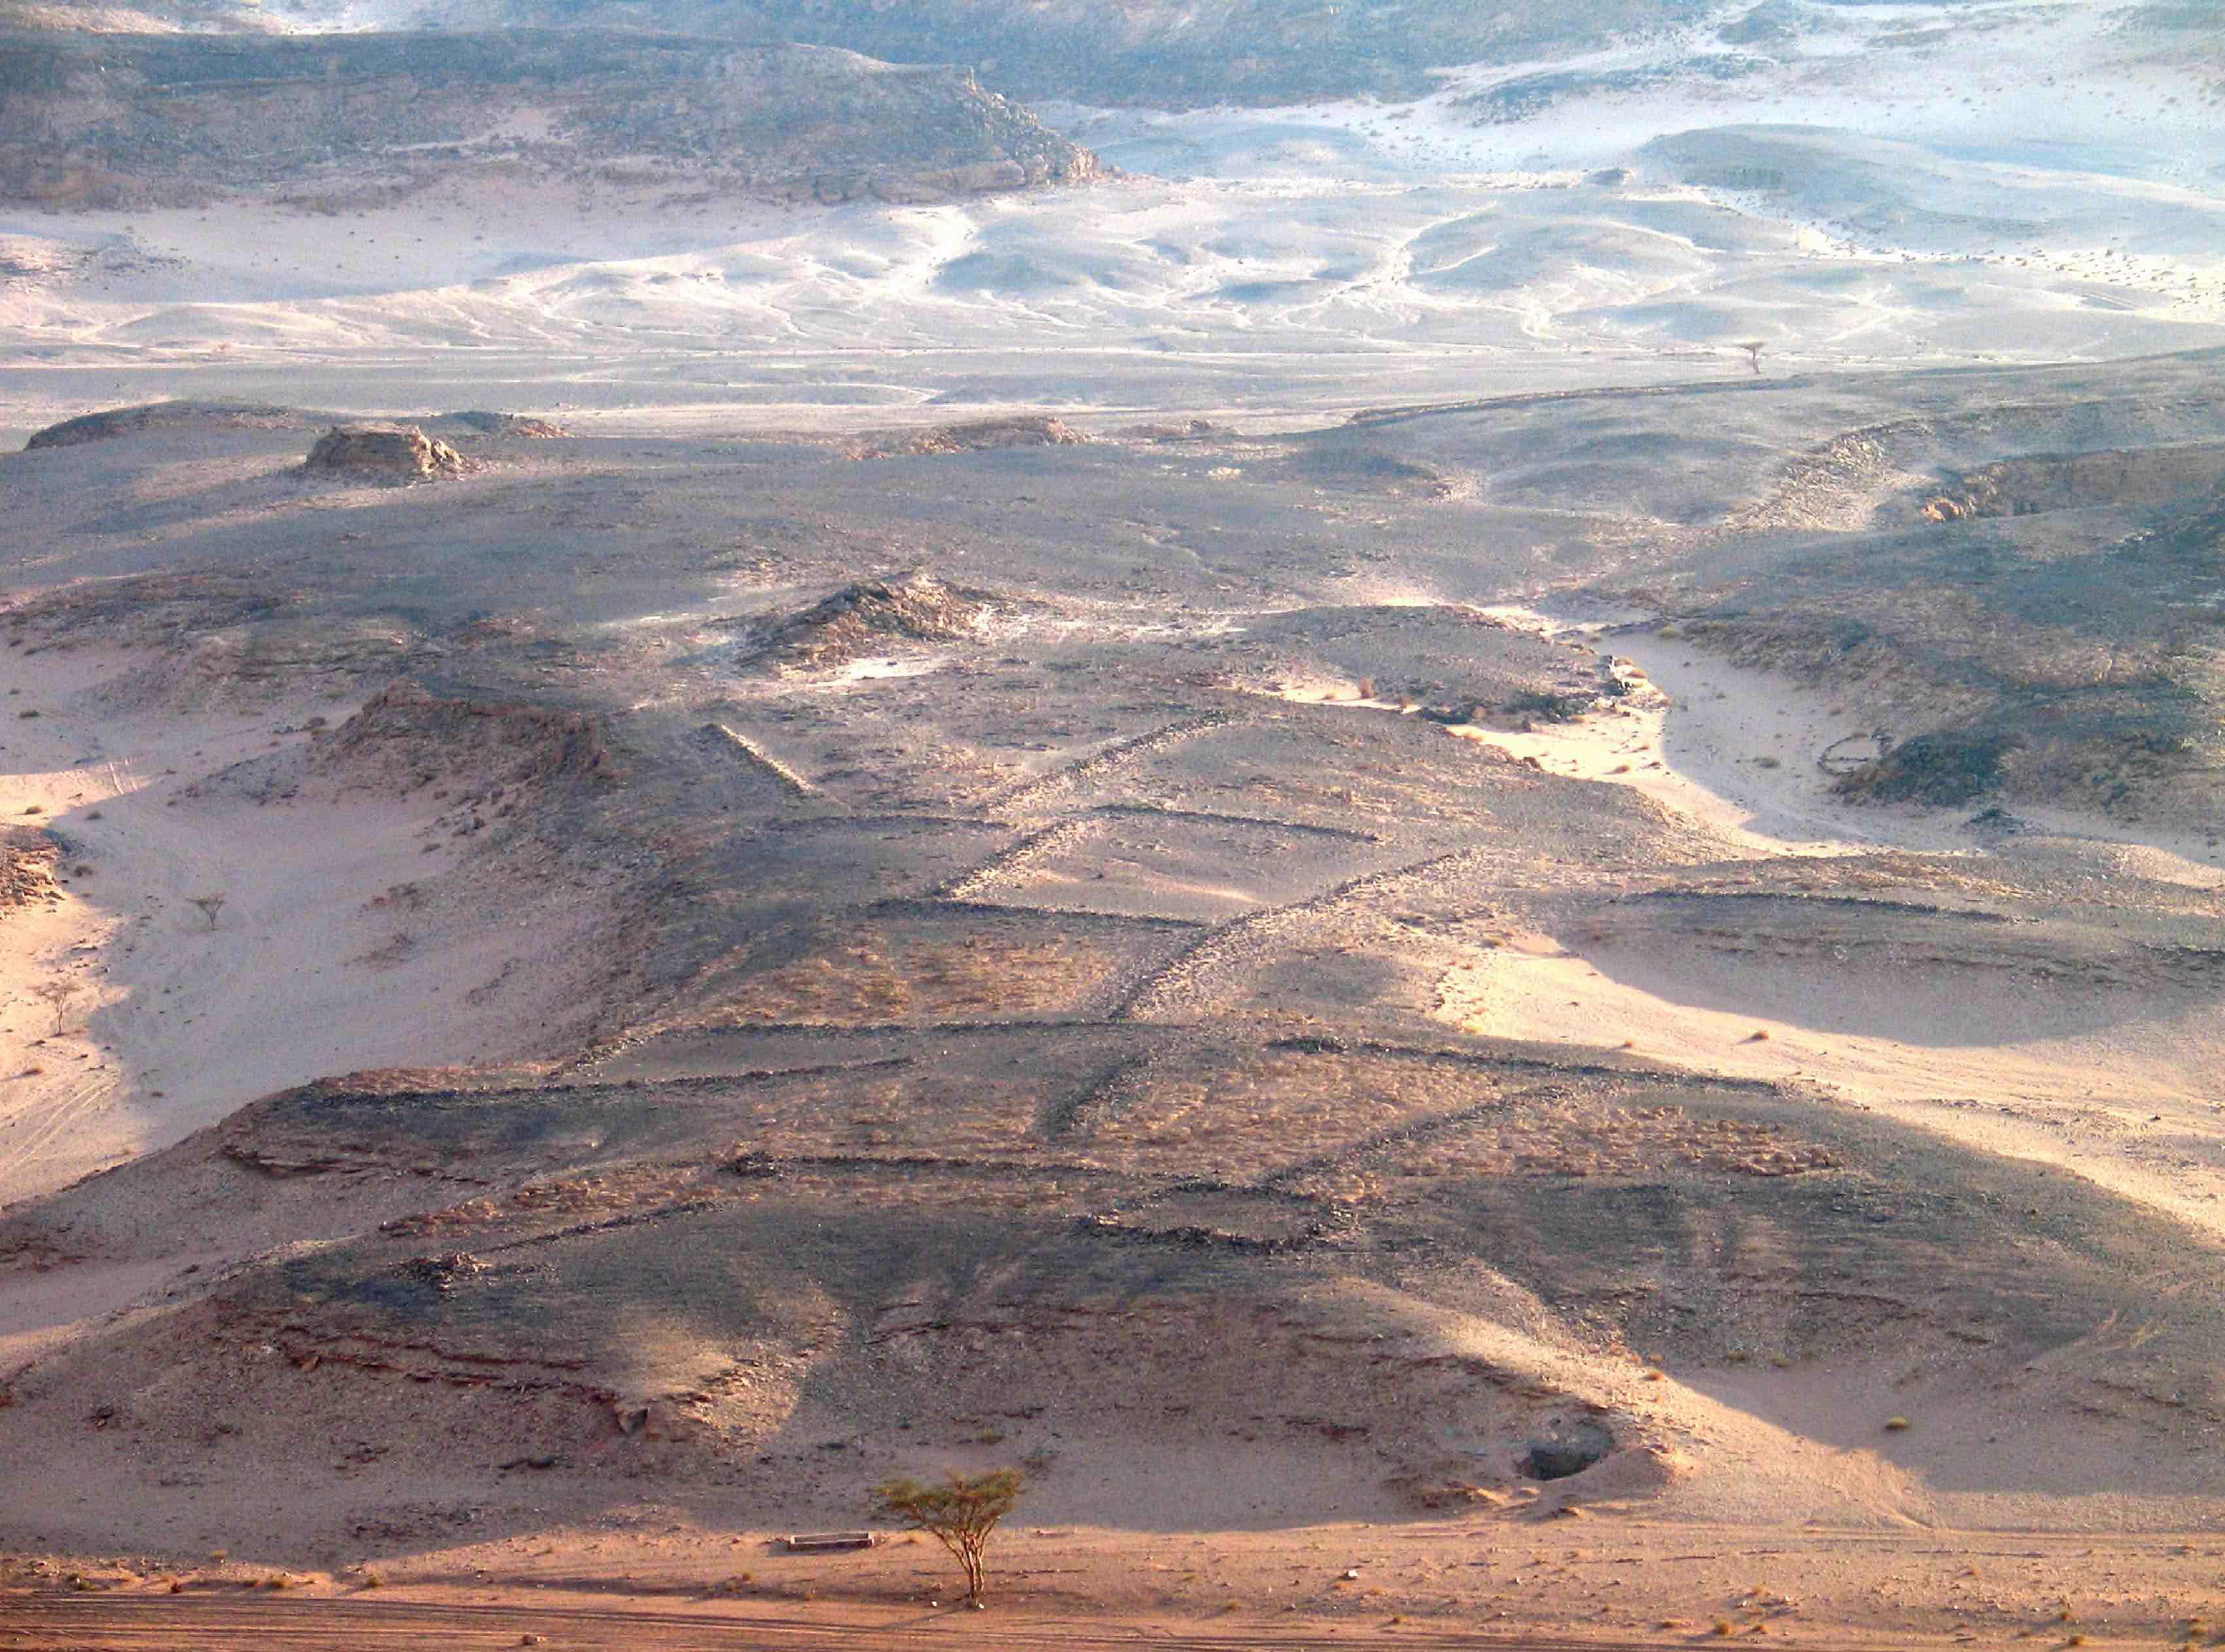 fig. Sinai 2-léger